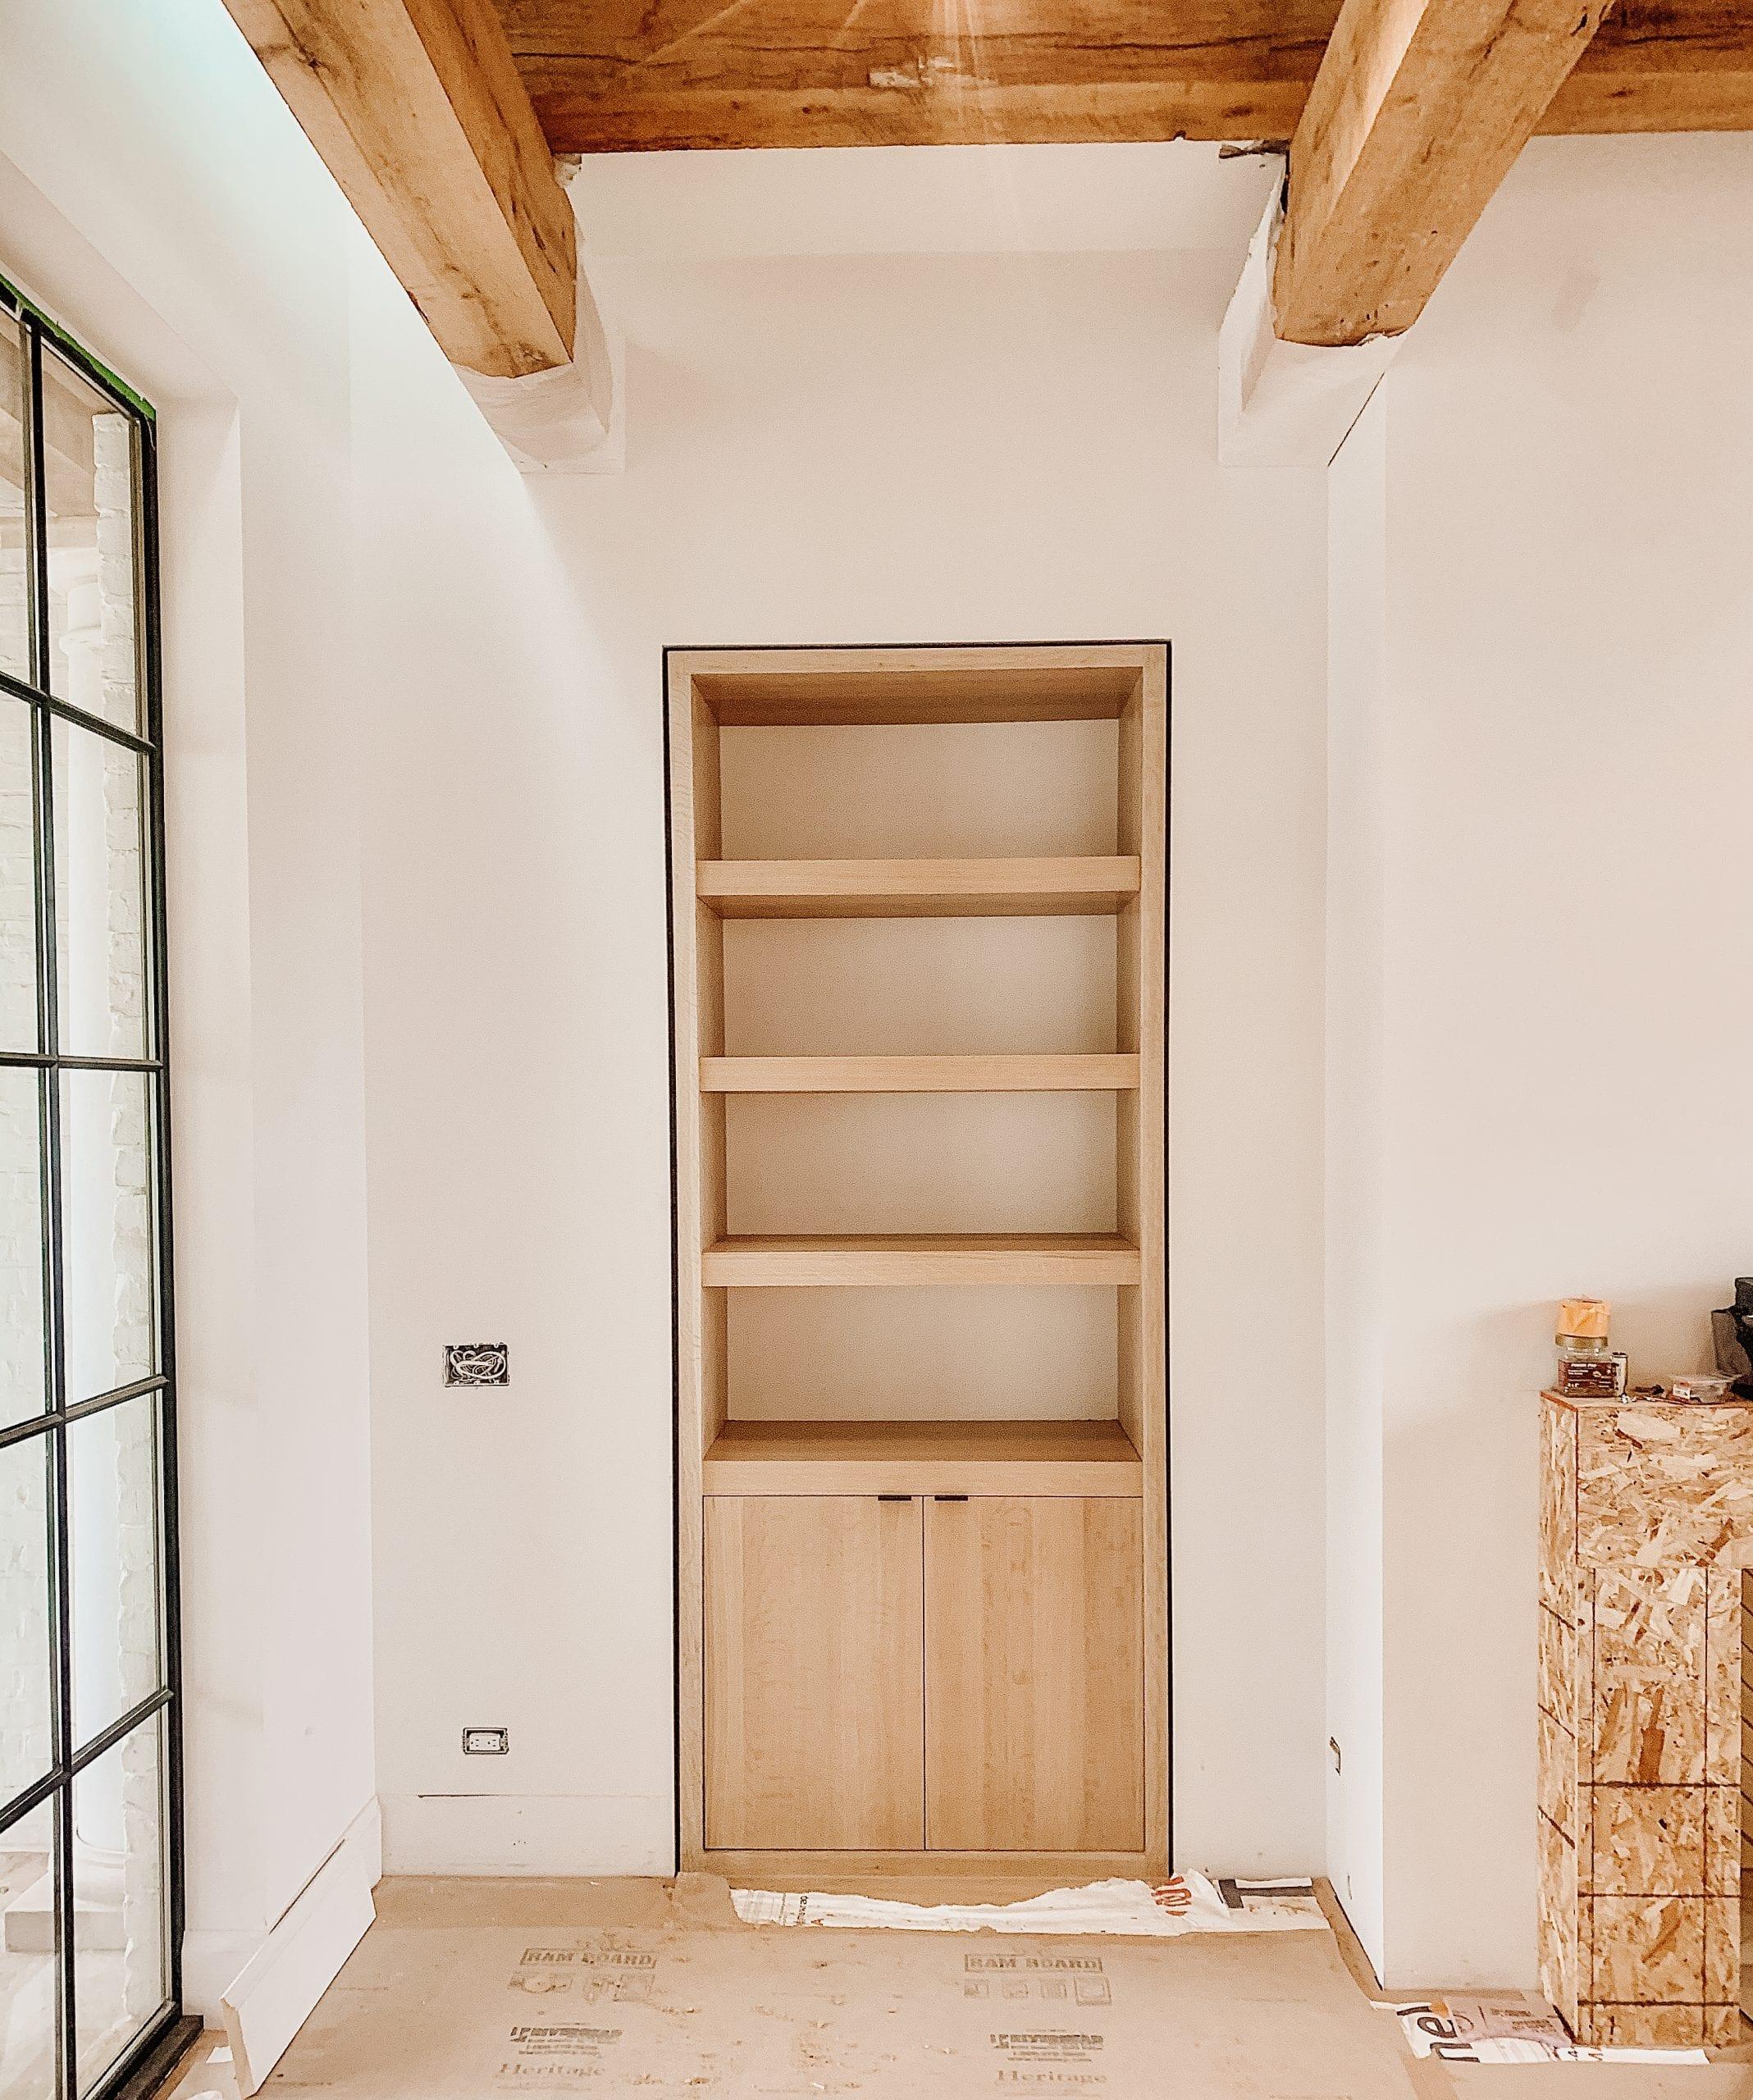 Built in wooden shelf with black details